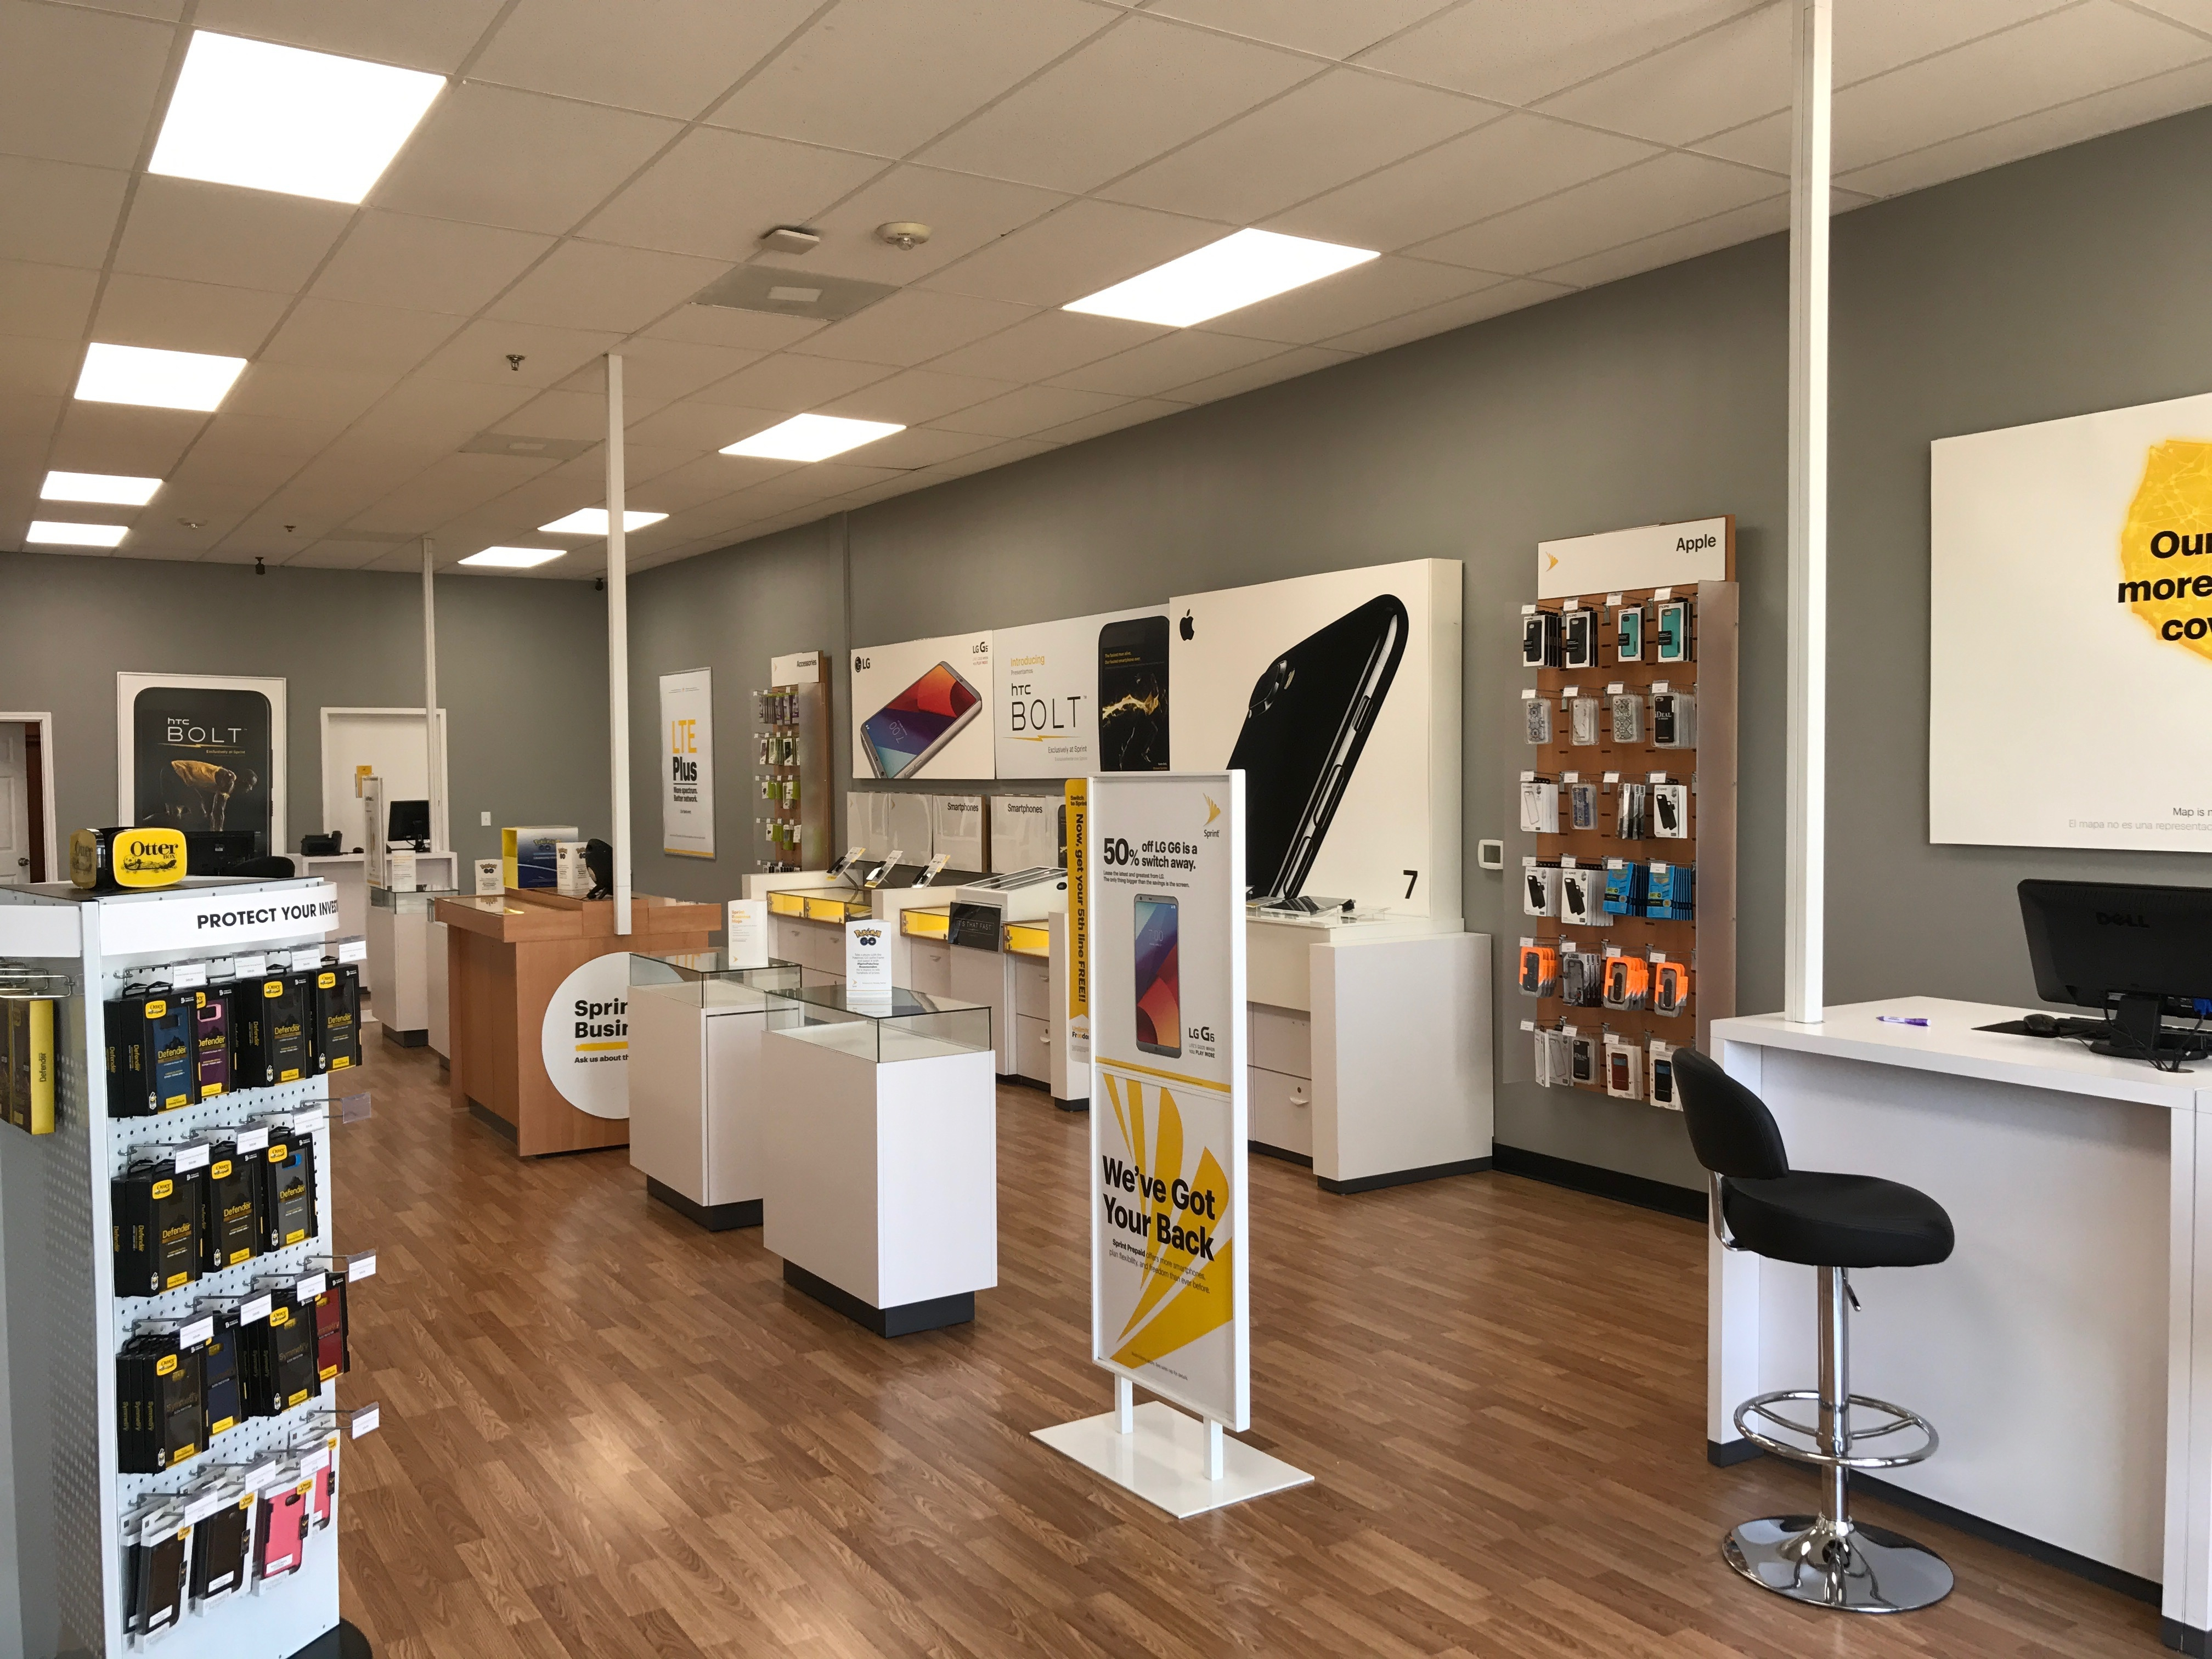 Sprint Store image 2